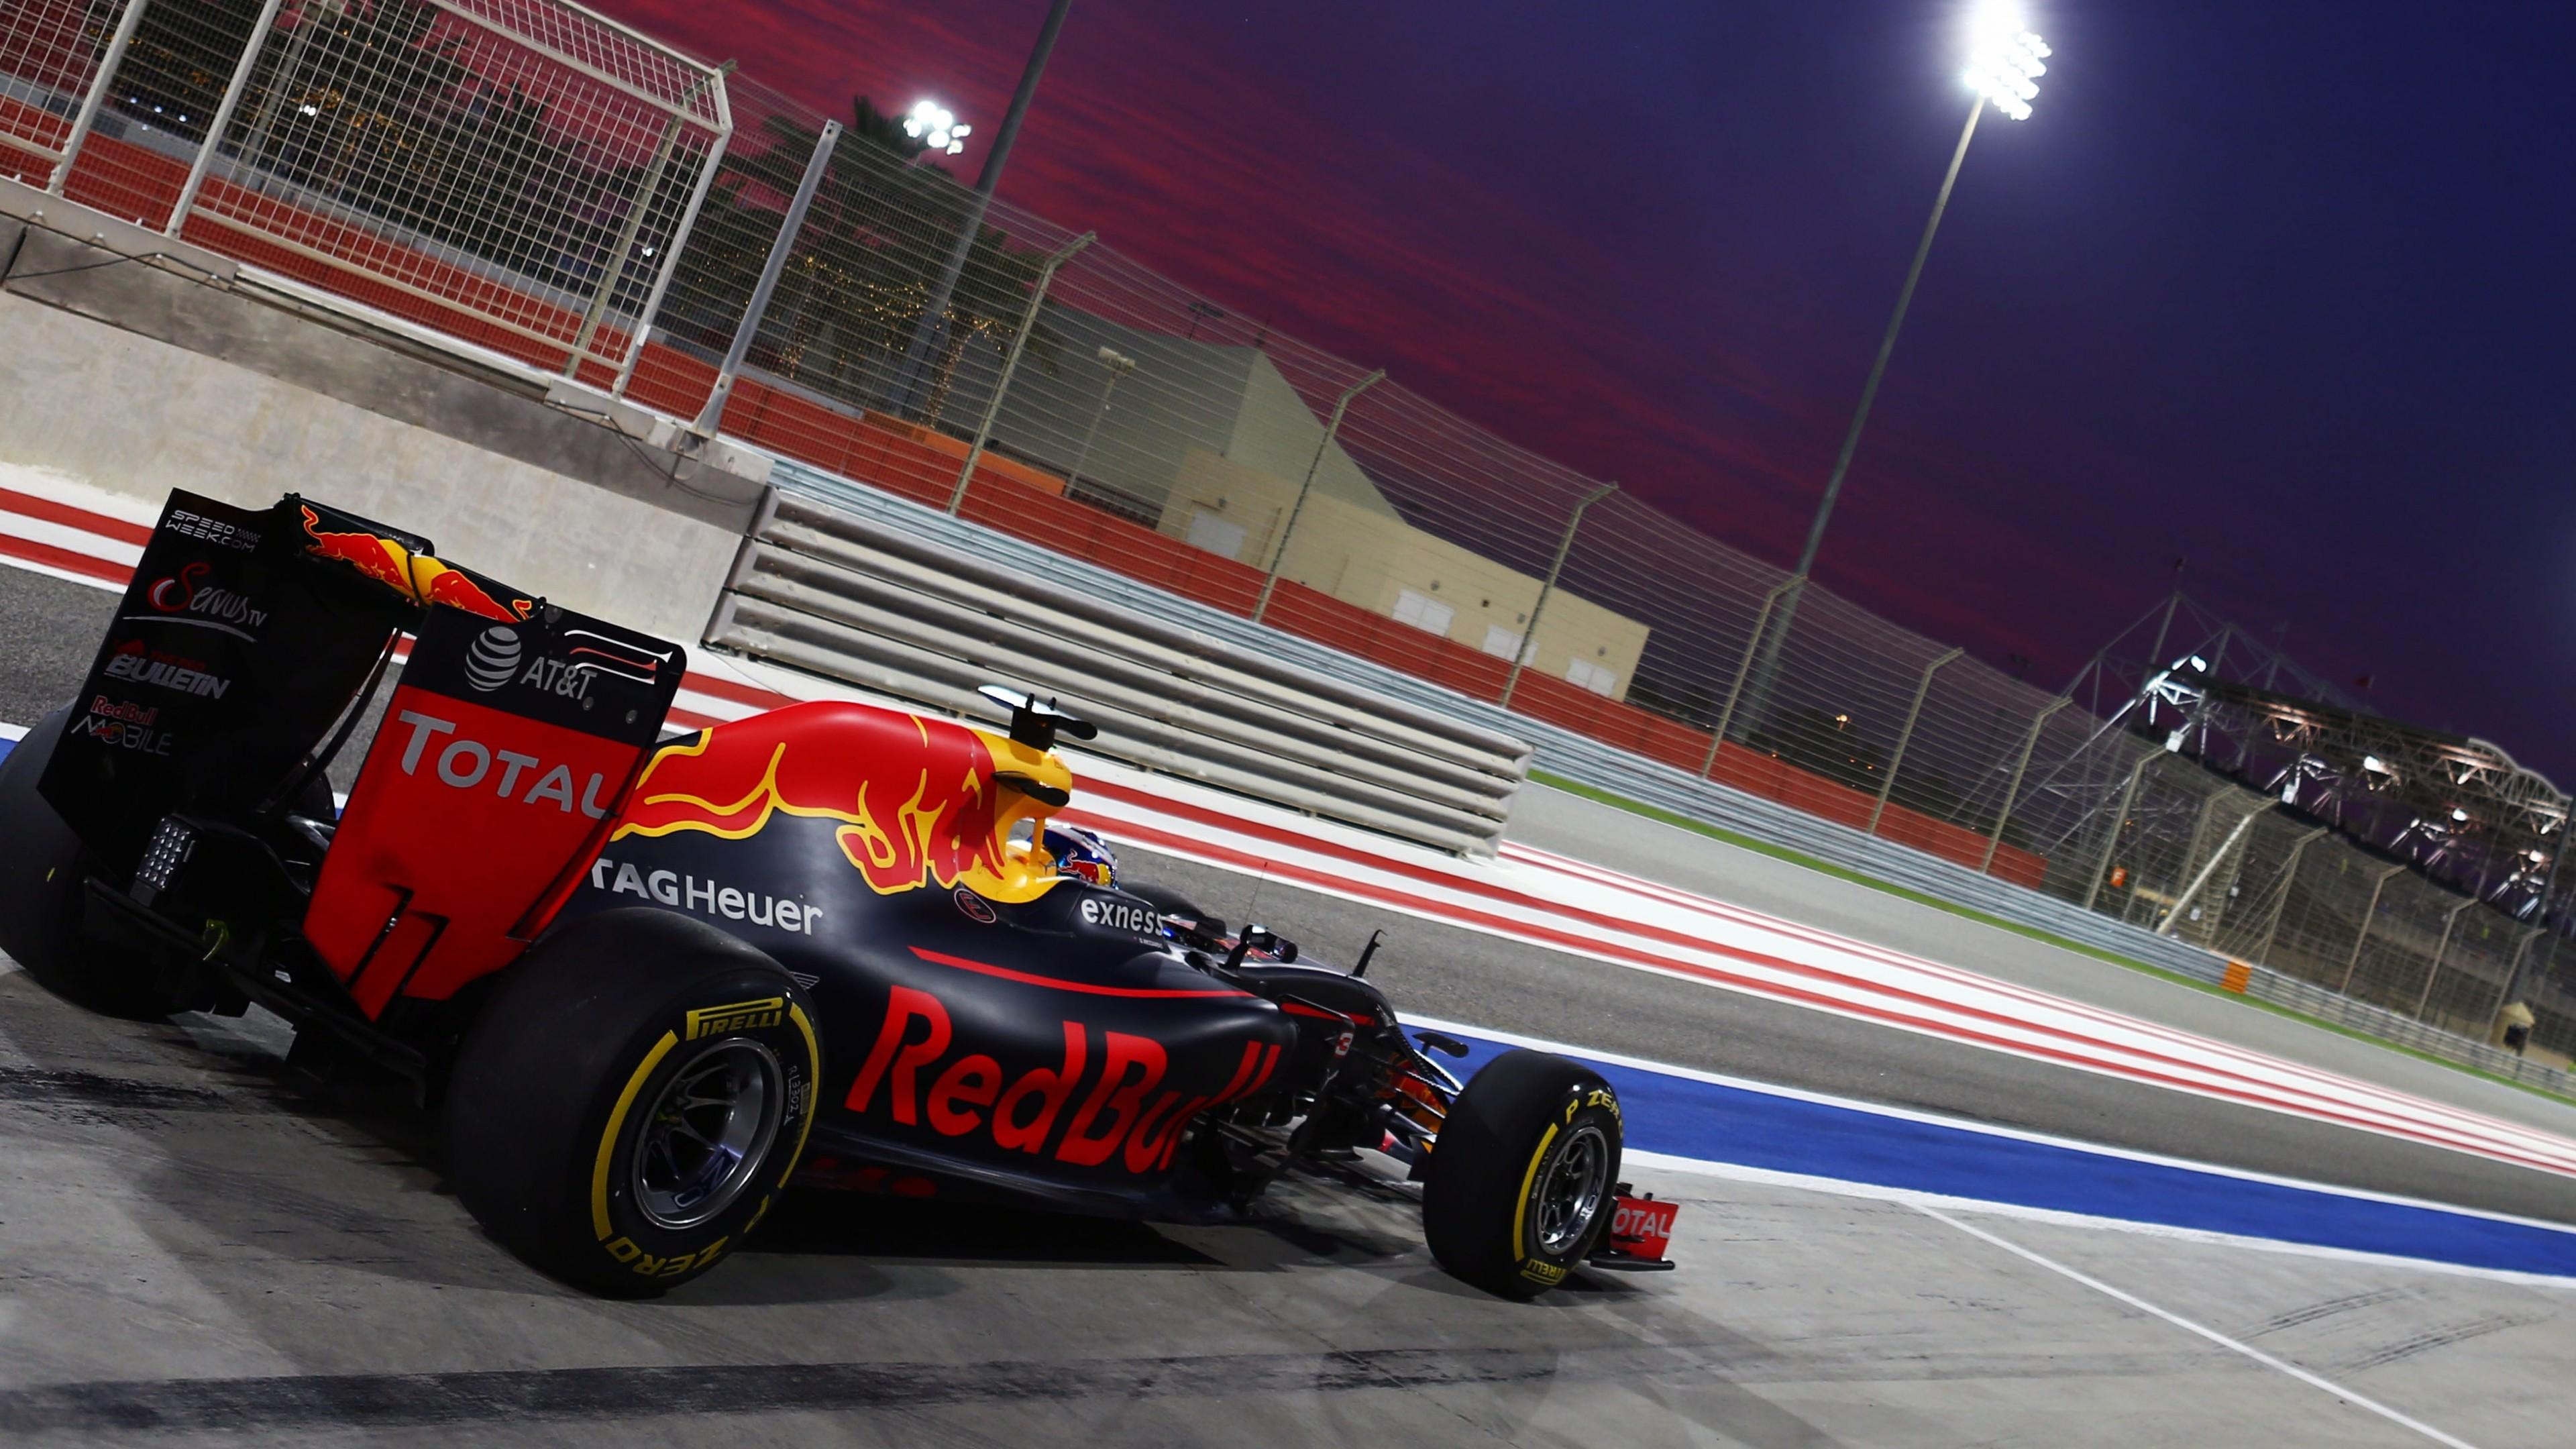 Wallpaper Red Bull Rb12 Red Bull Racing F1 Cars Amp Bikes